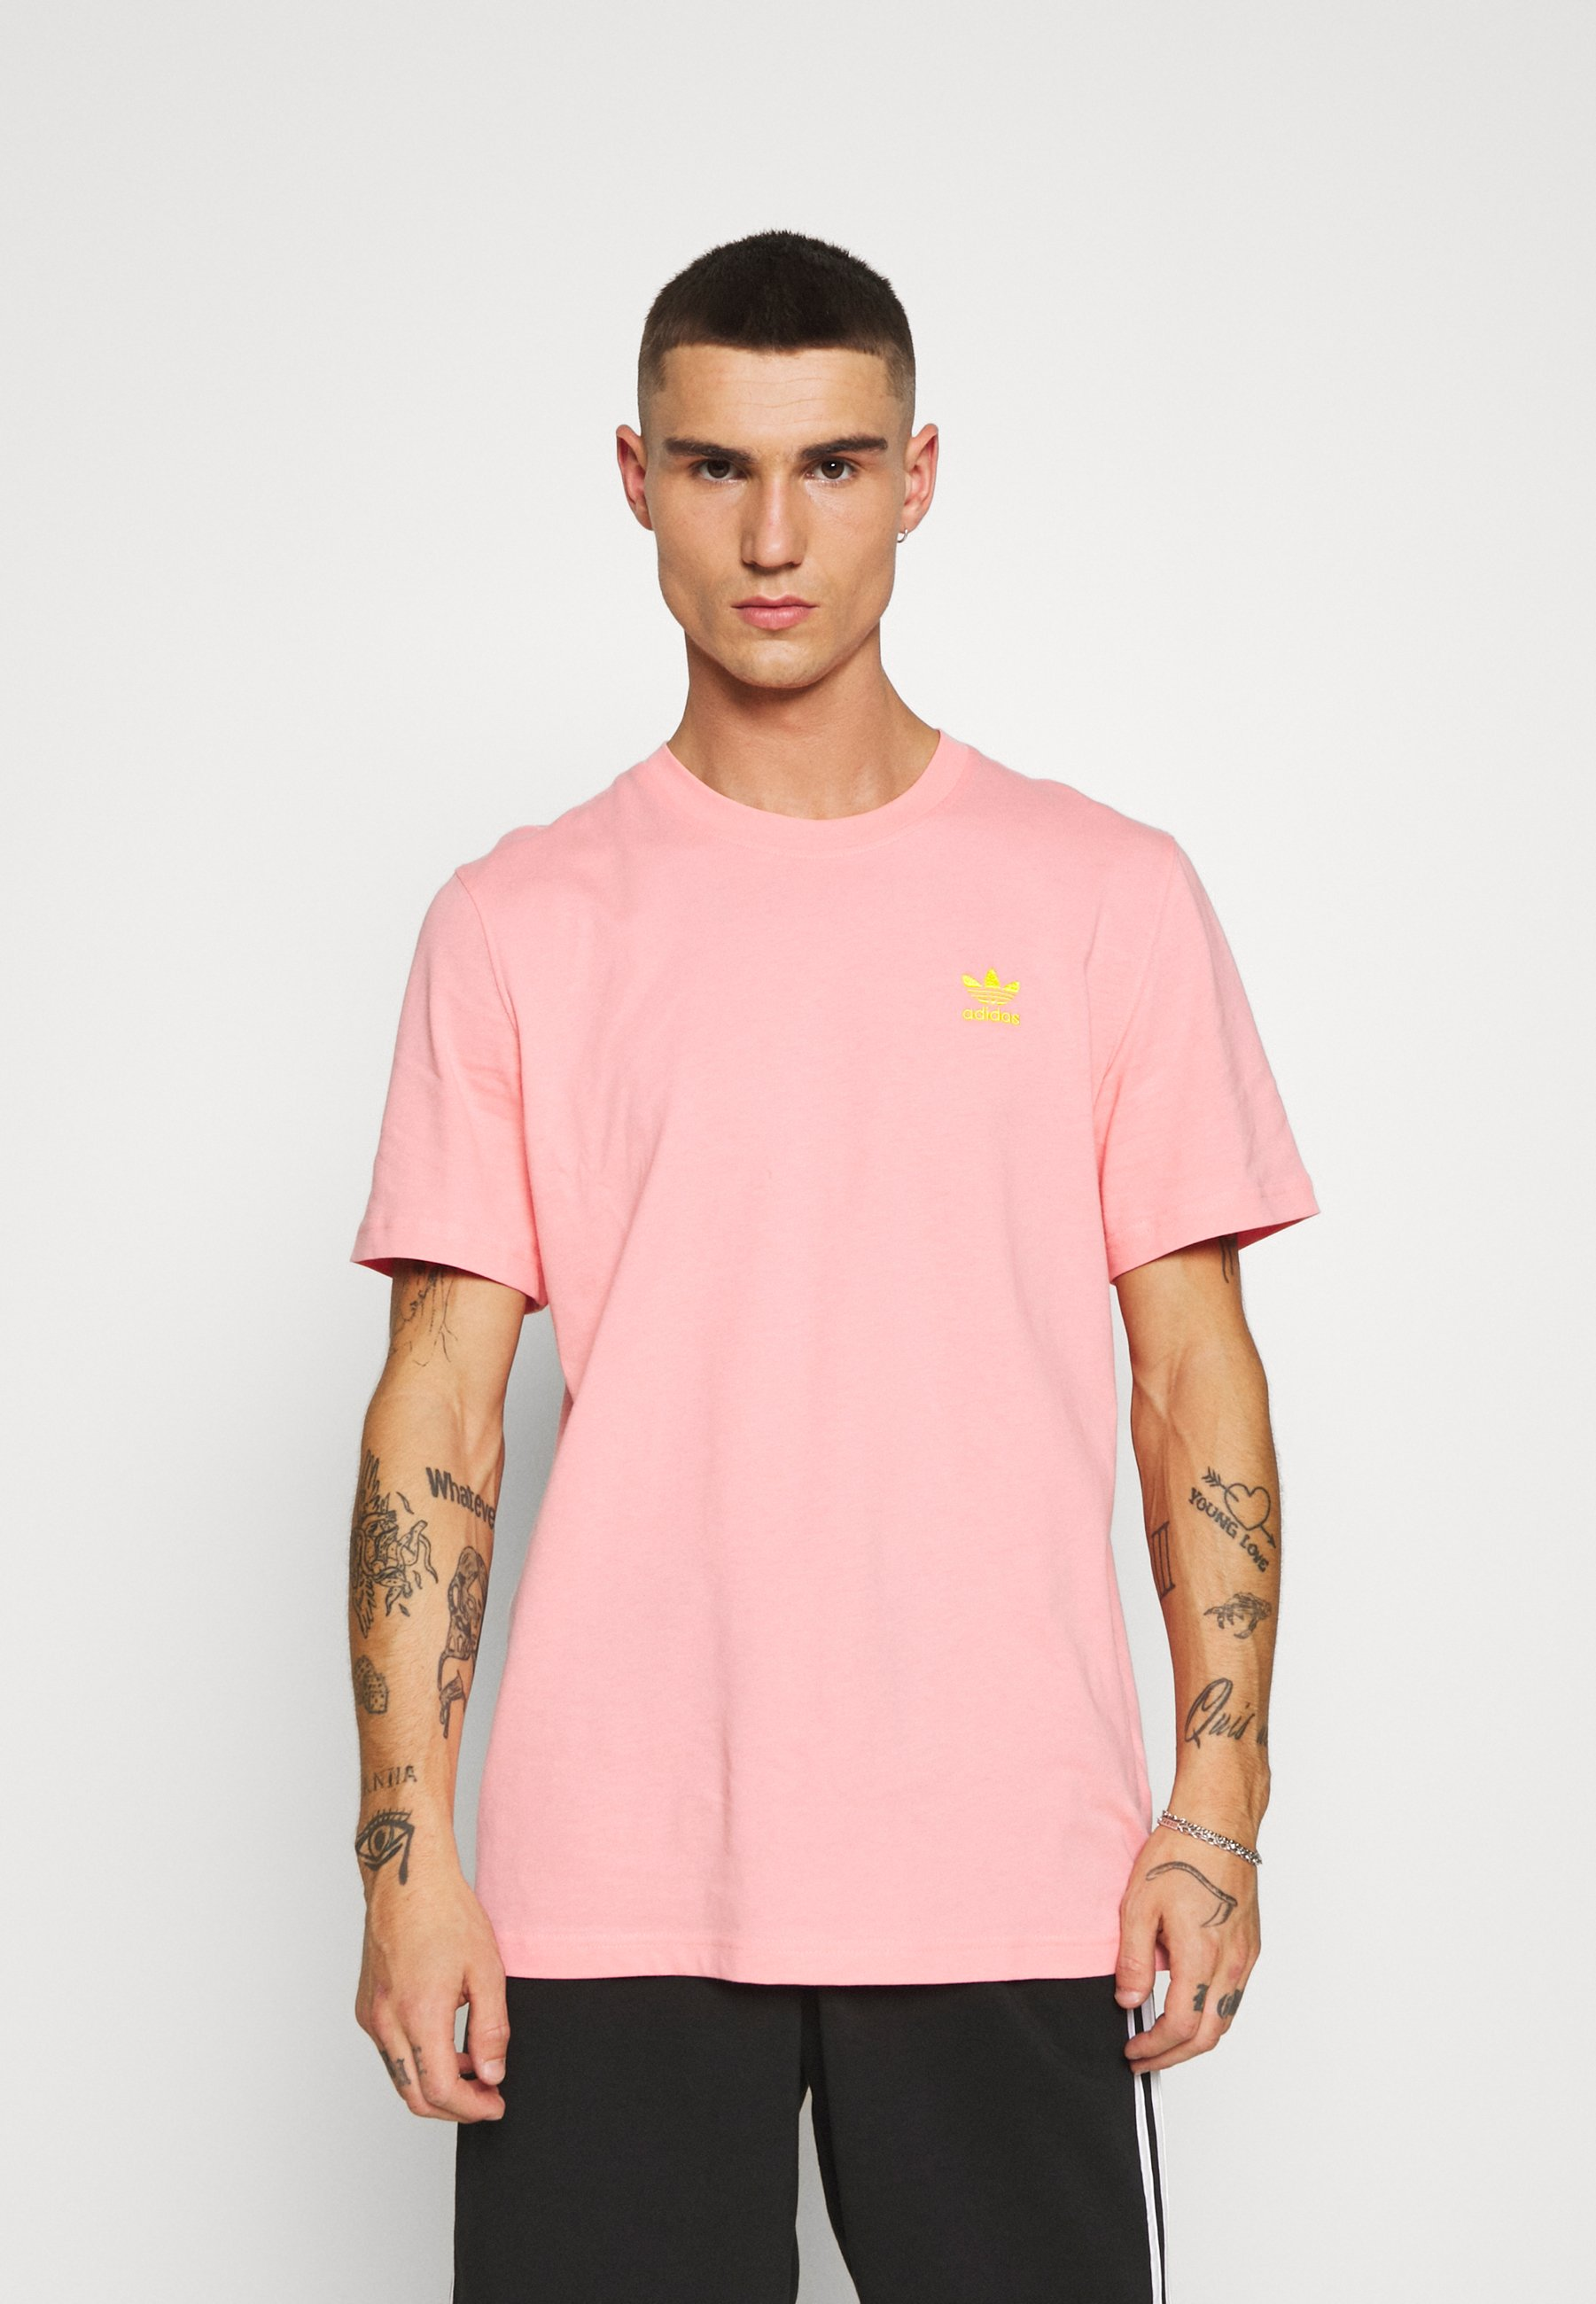 adidas Originals Front Back Tee Glory Pink